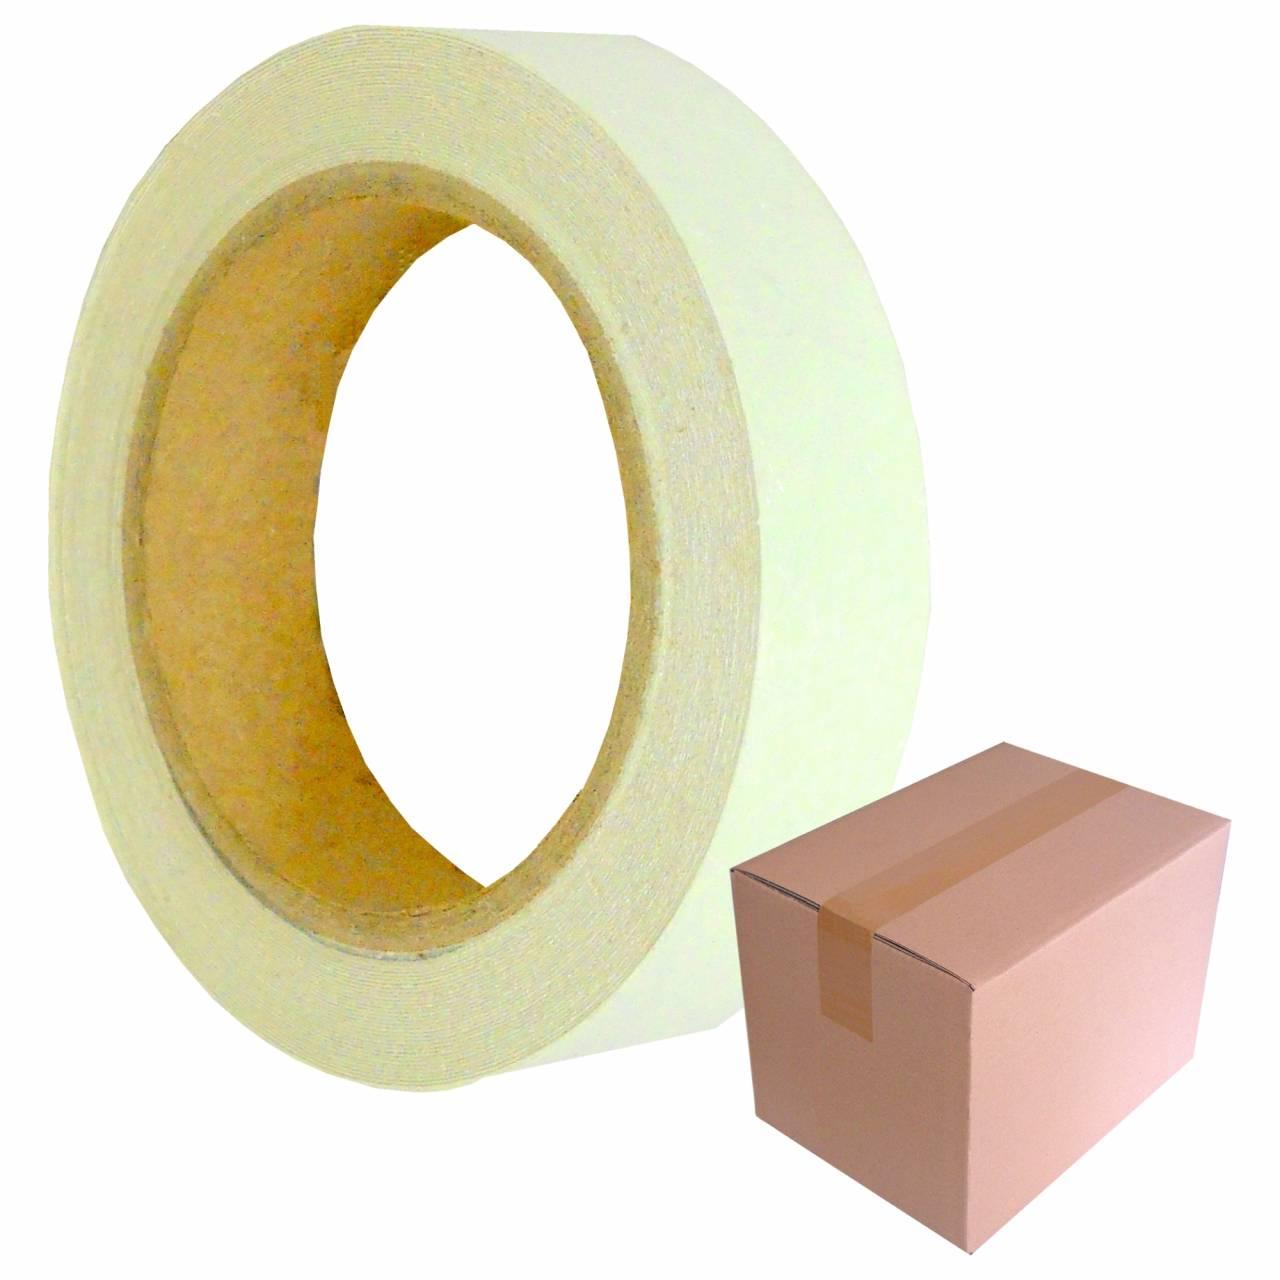 Phosphorband T206, 25 mm x 10 m / Krt a 24 Rollen